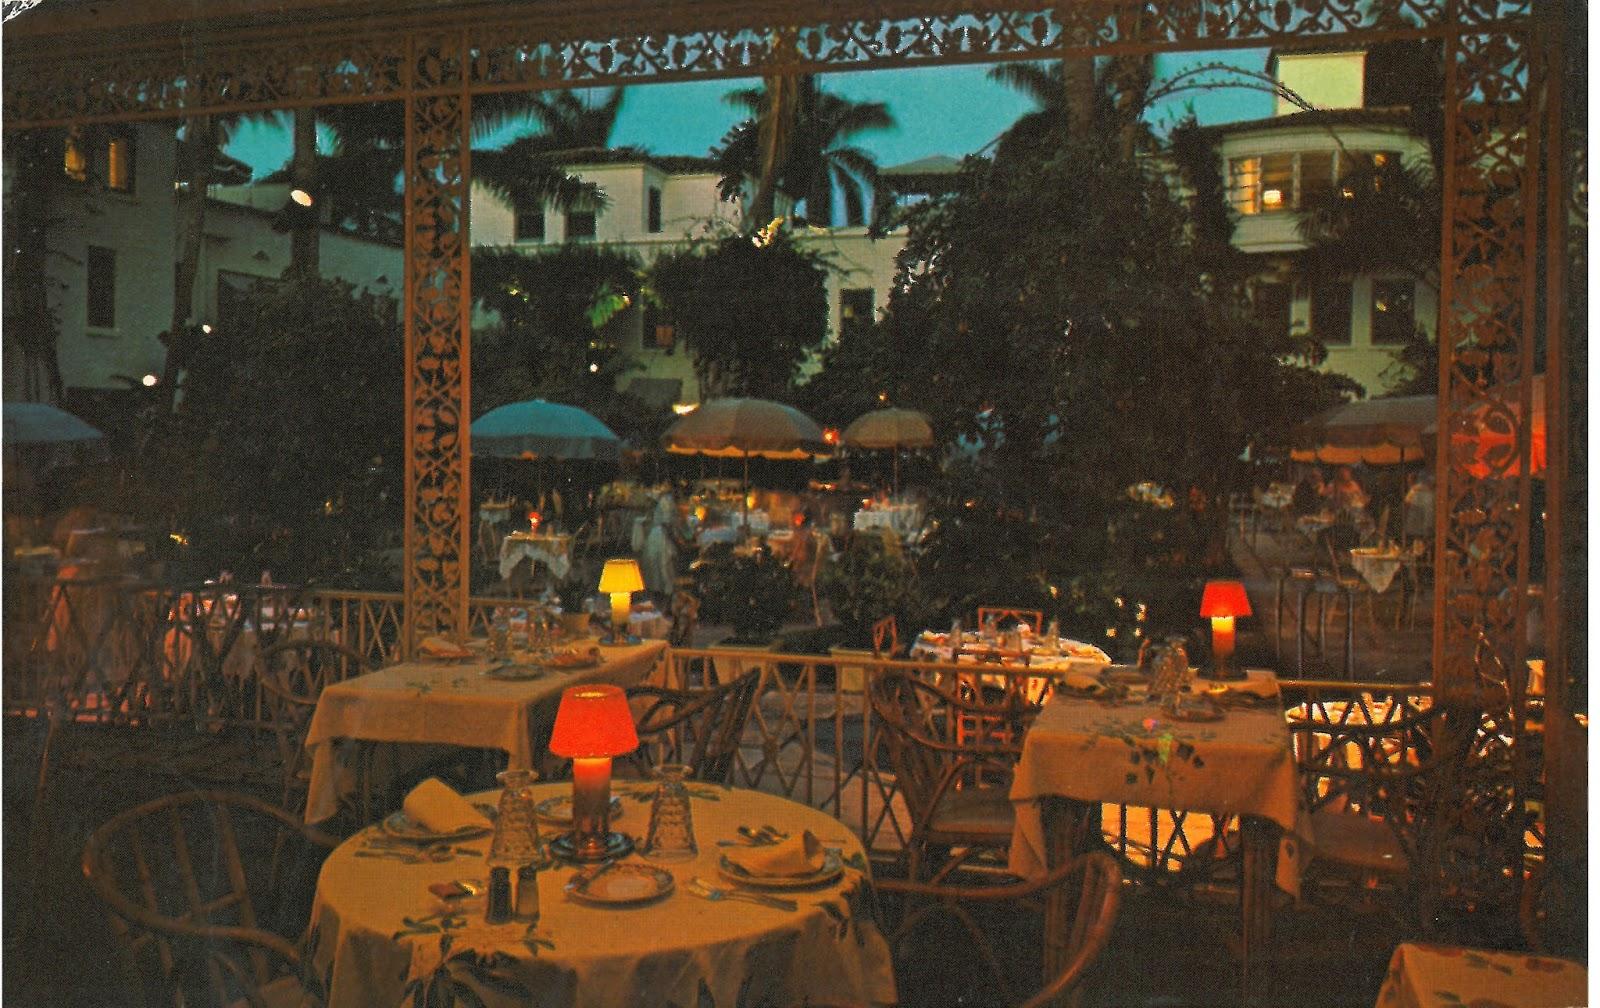 The Brazilian Court Palm Beach Celebrates 90 Years - The Glam Pad